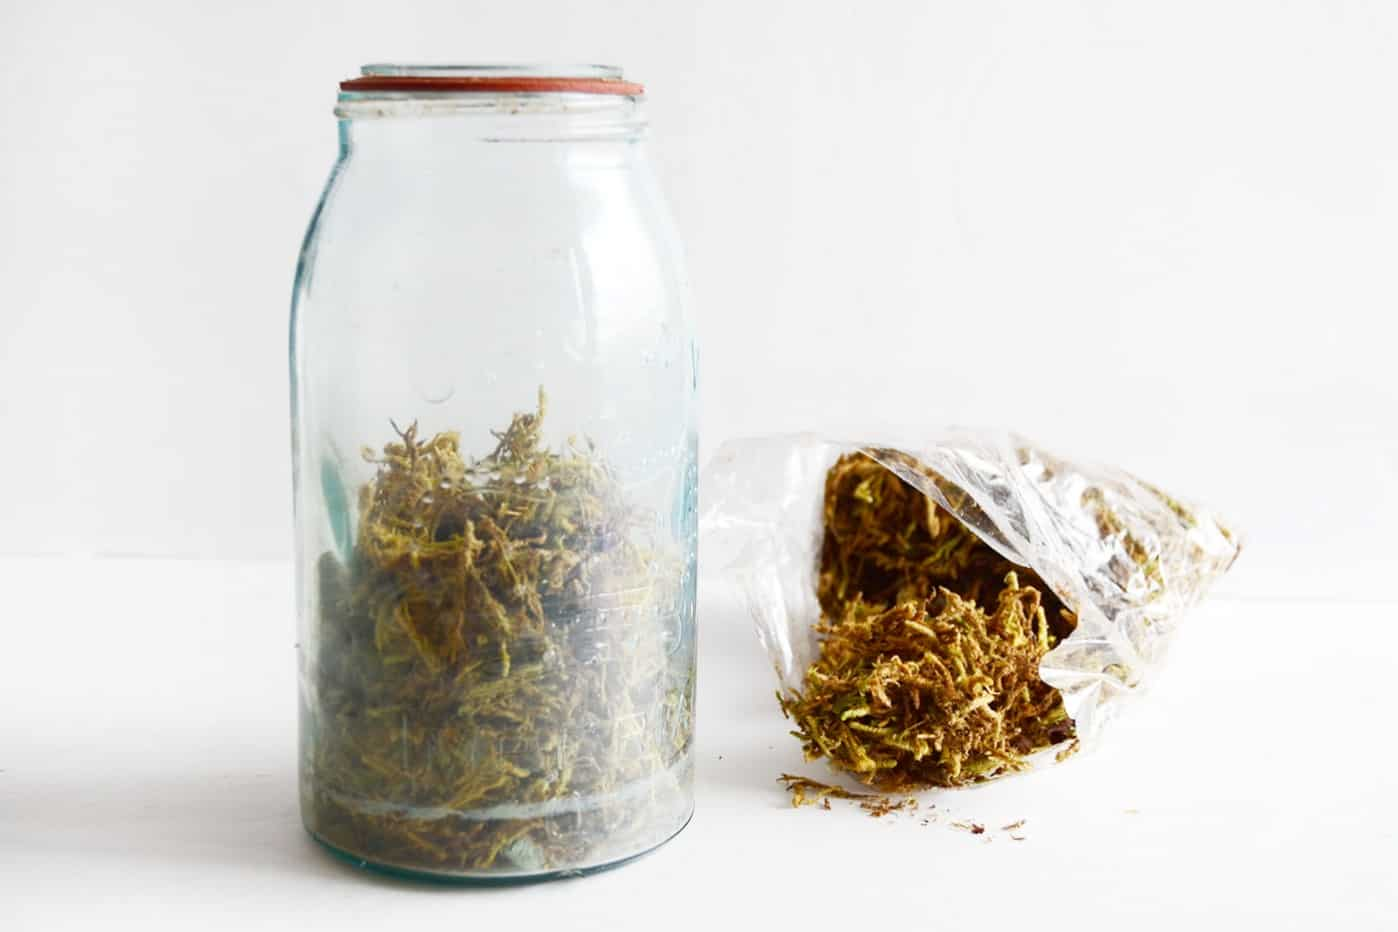 mason jar with spanish moss inside